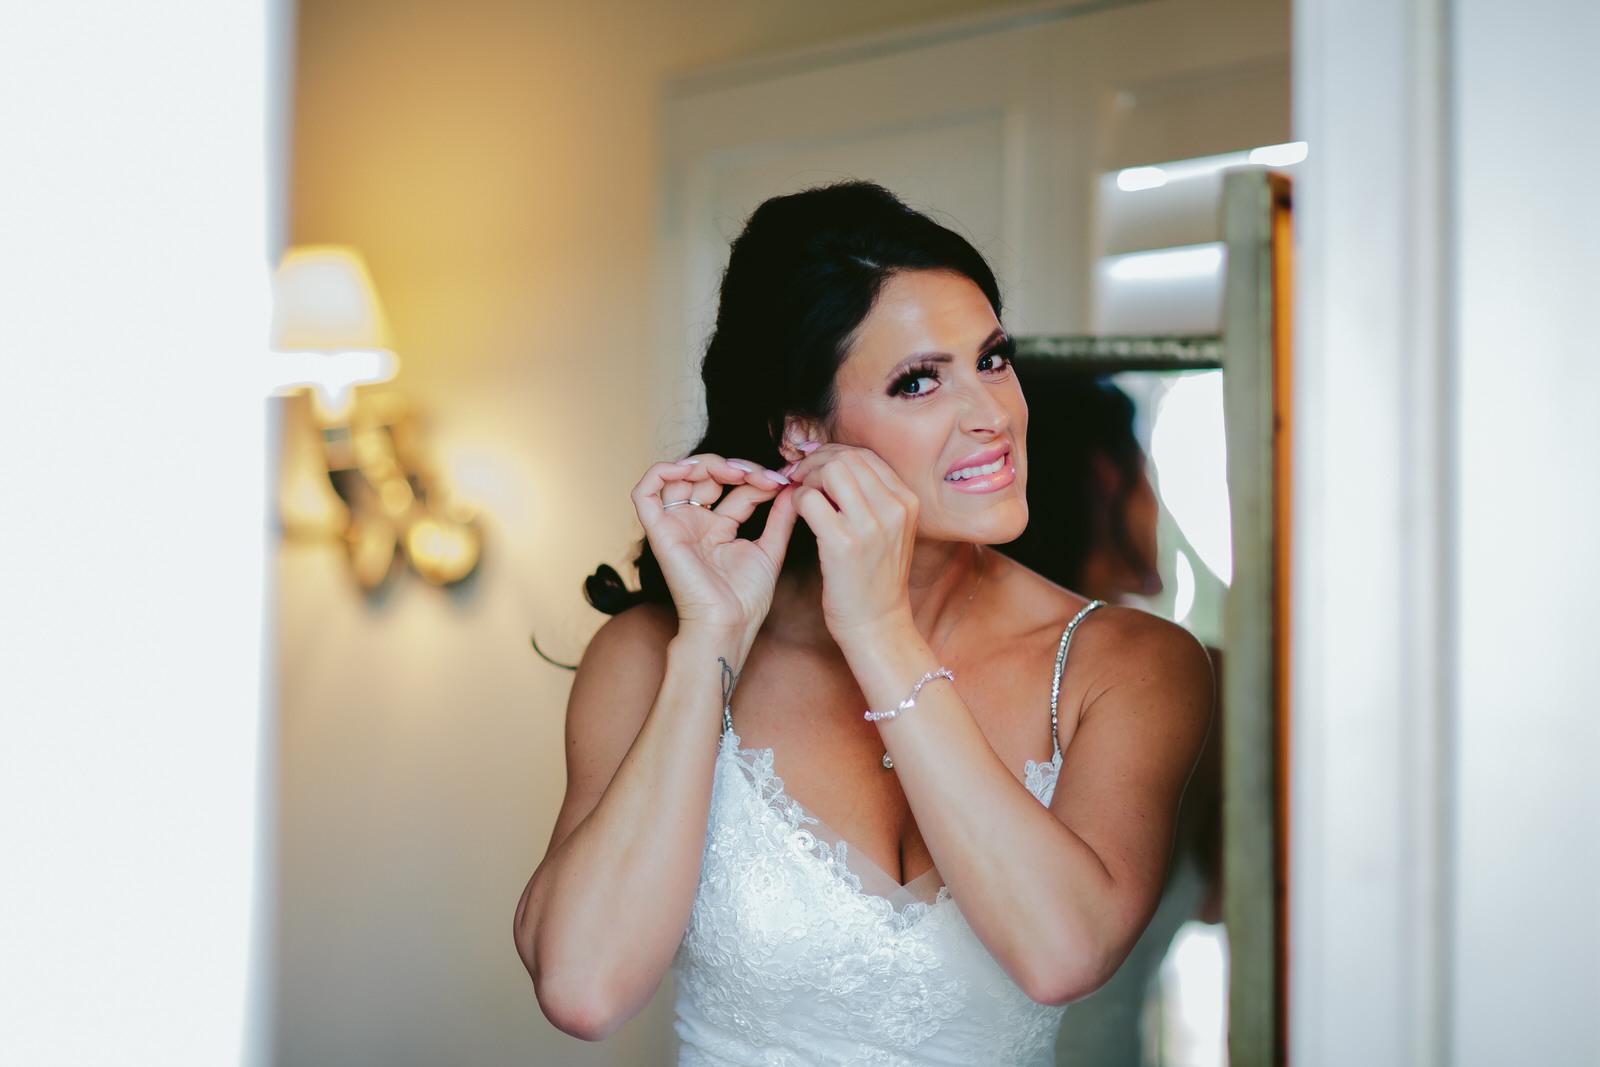 bride_getting_ready_tiny_house_photo_stephanie_lynn_florida_weddings.jpg